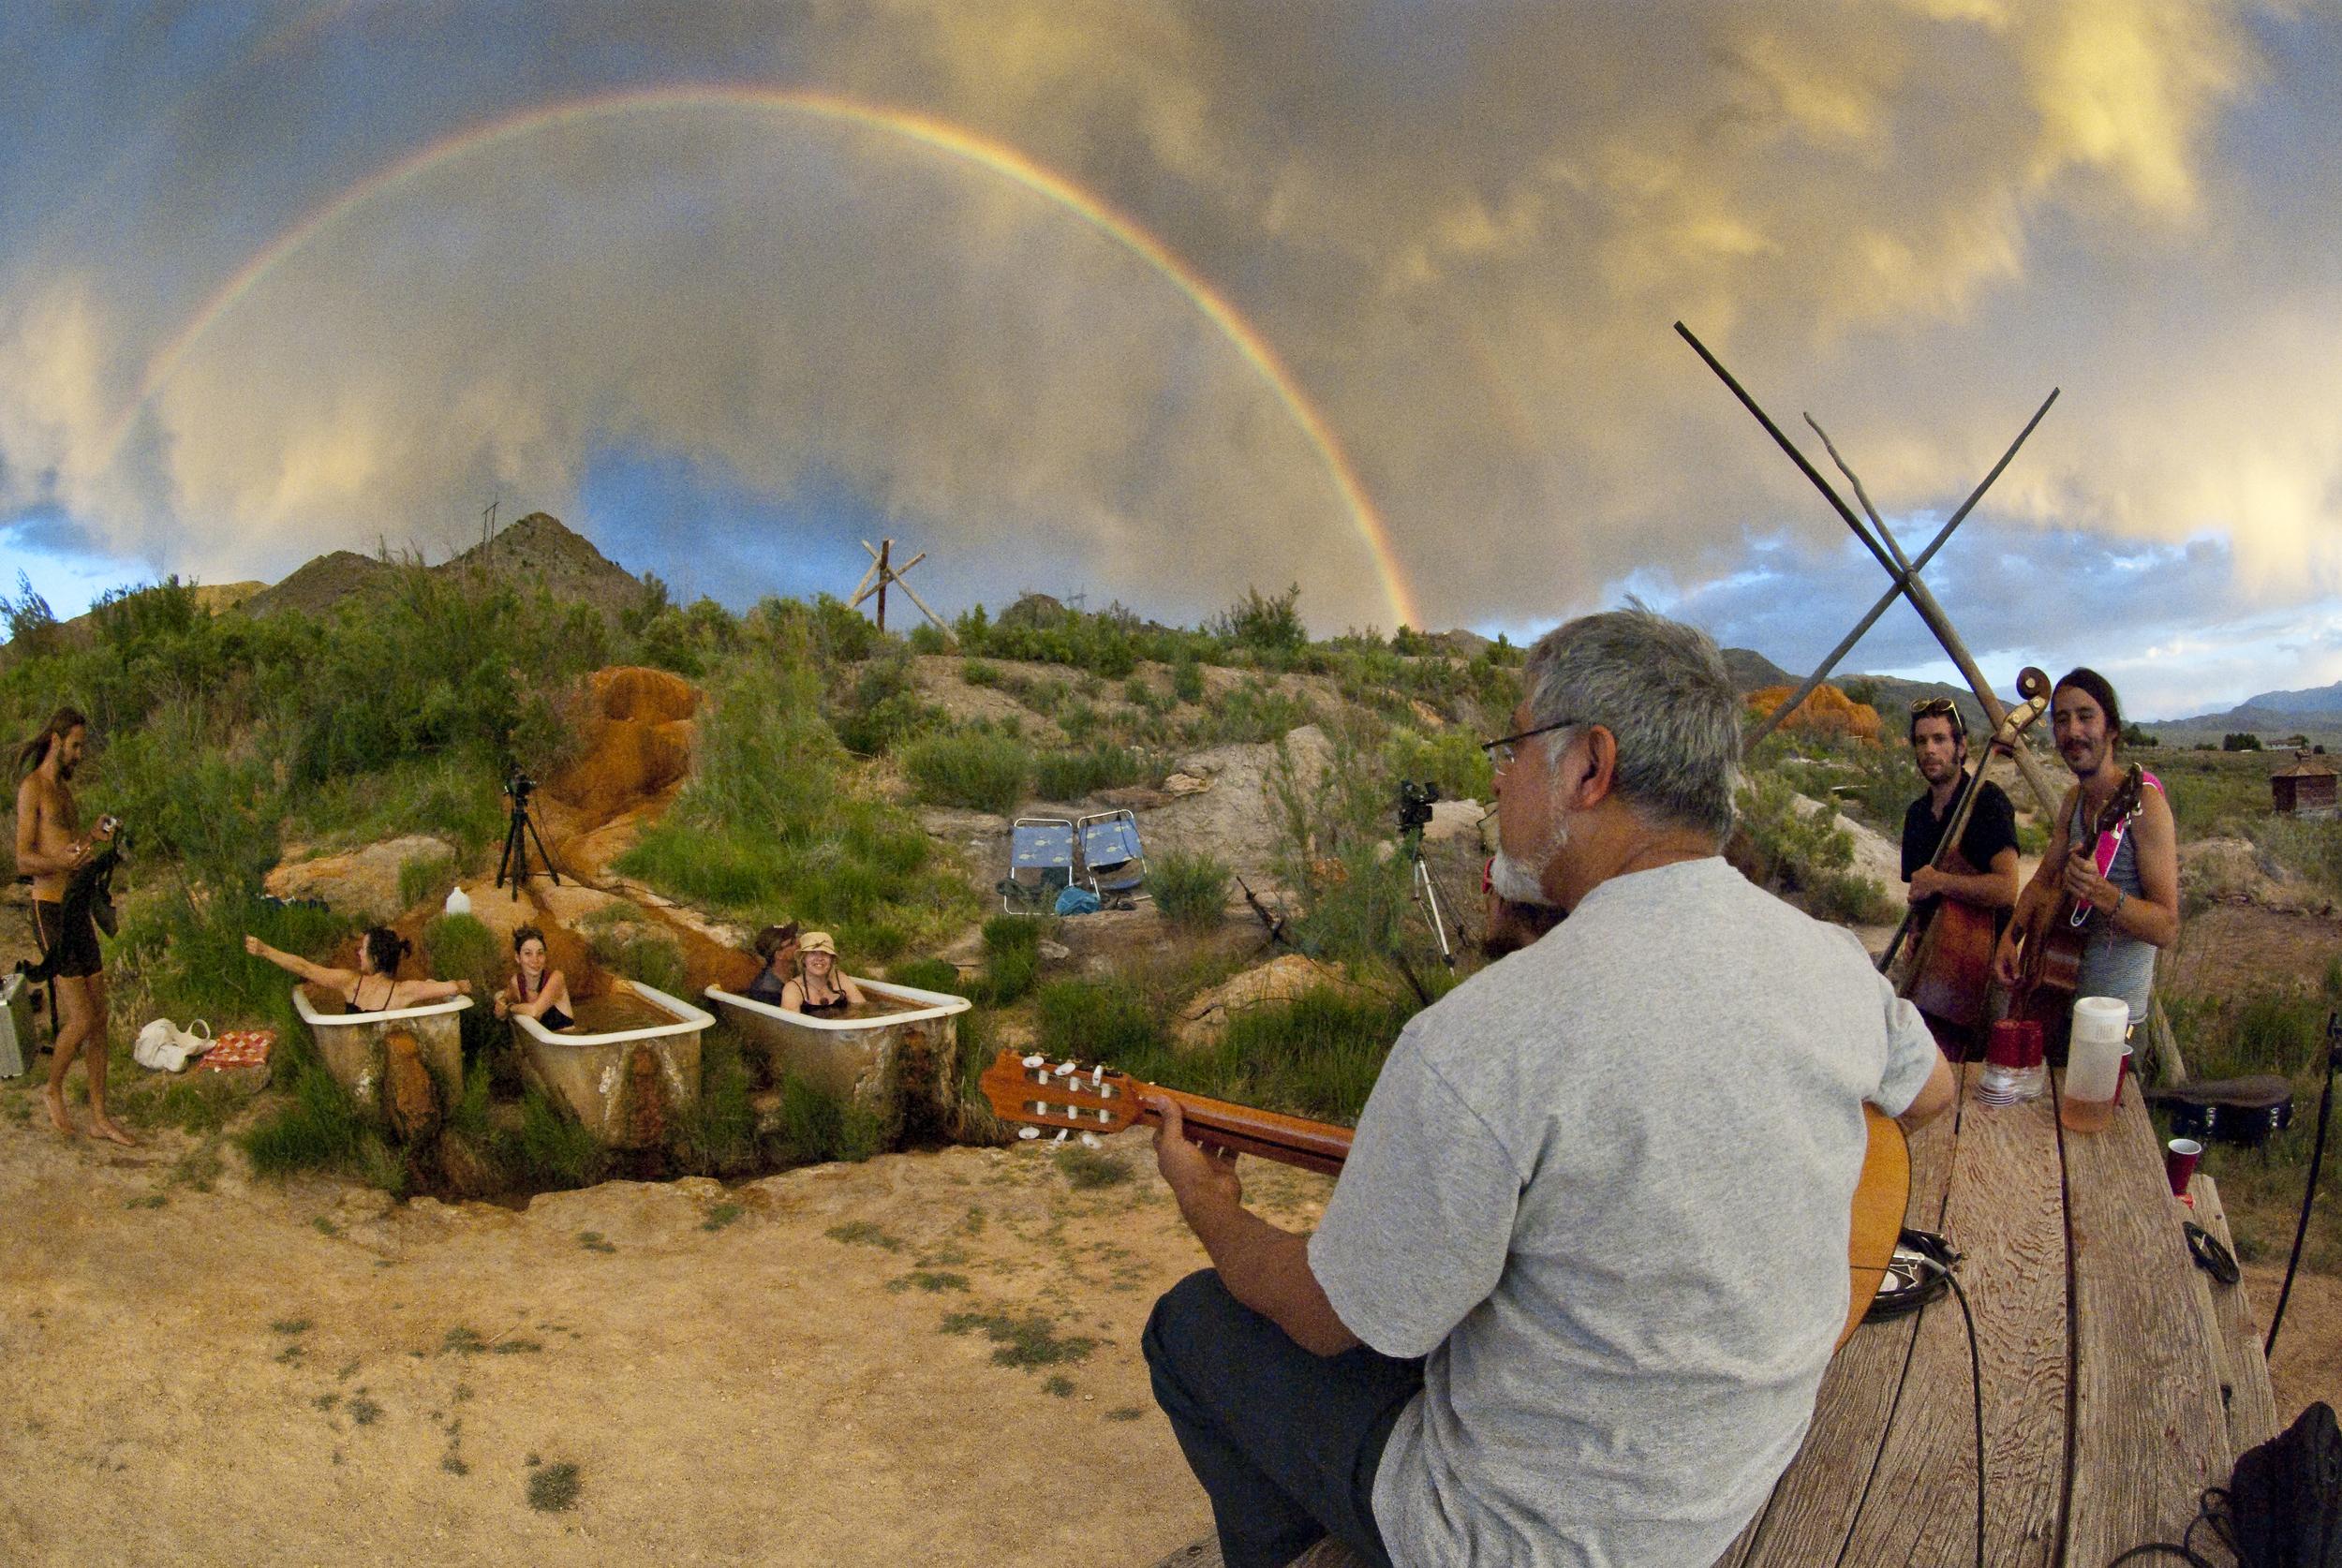 Fareed Haque & double rainbow @ Mystic